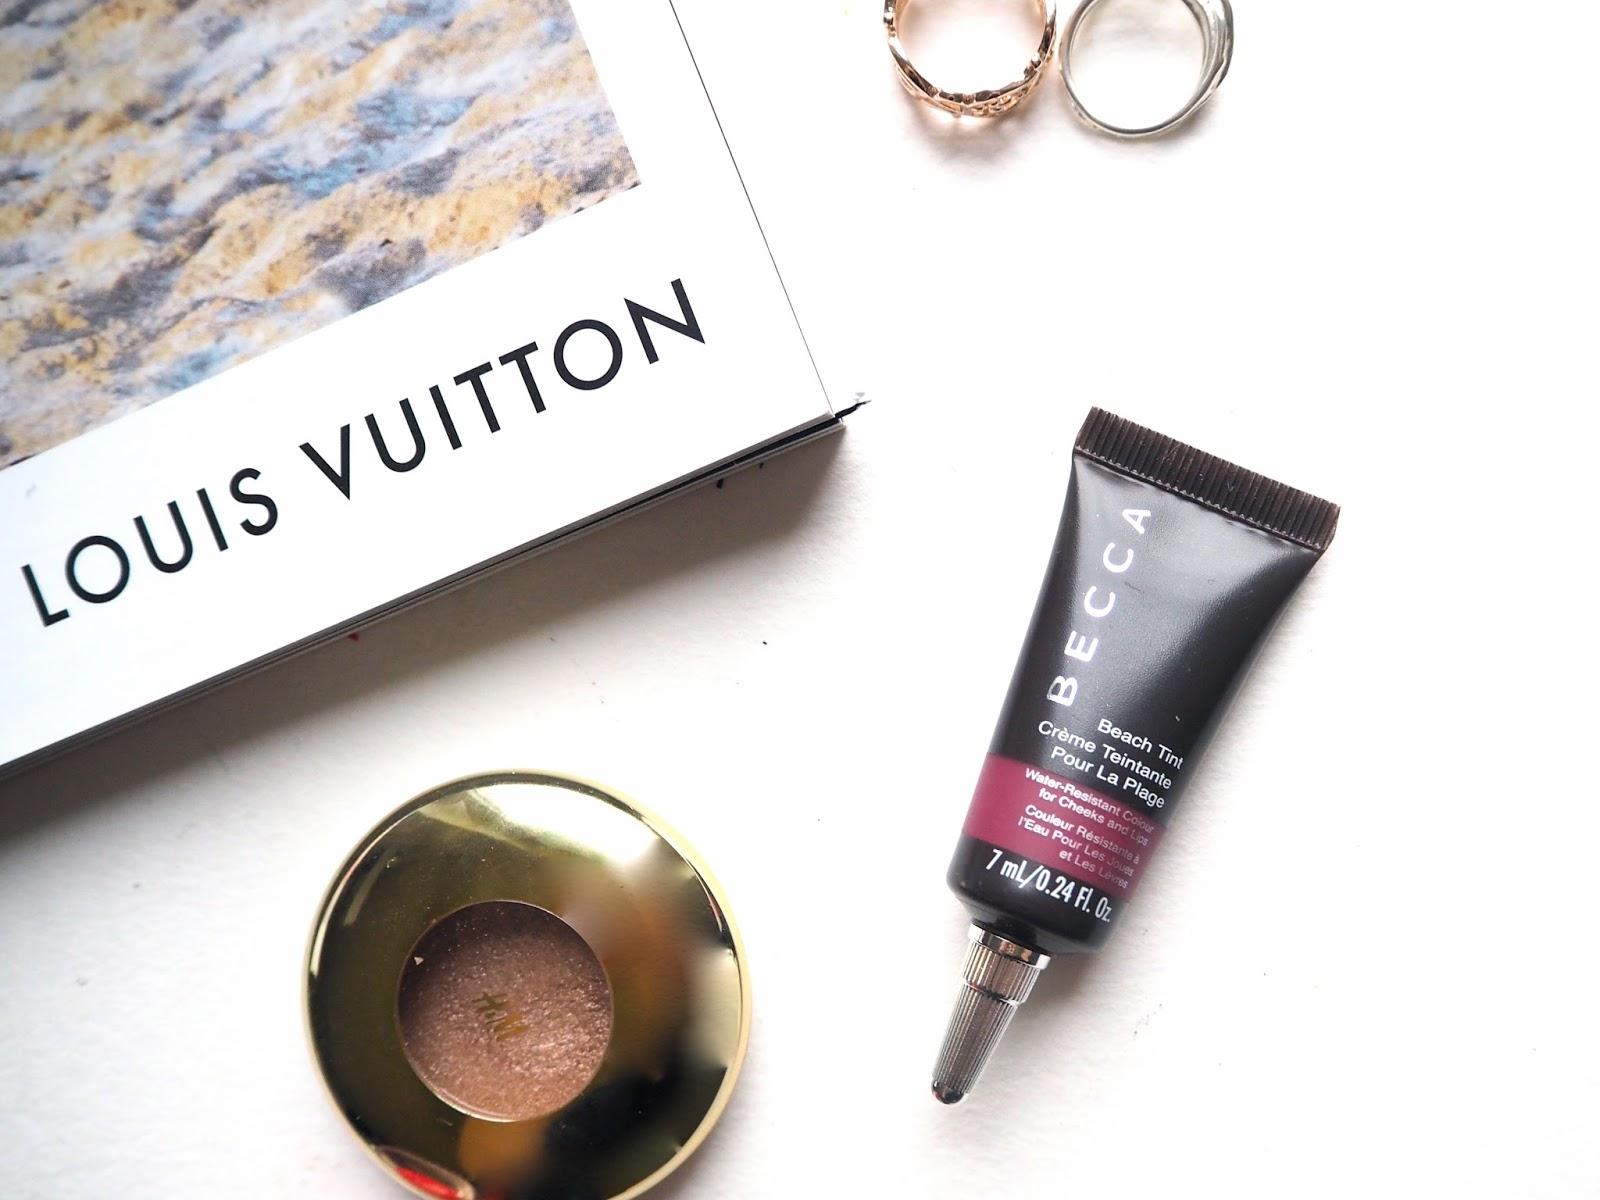 A Little Beauty Haul, foundation, bourjois healthy mix, eyeshadow, inglot, hm, paradise lost, becca beach tint, raspberry, nxy blush, cinnamon, haul